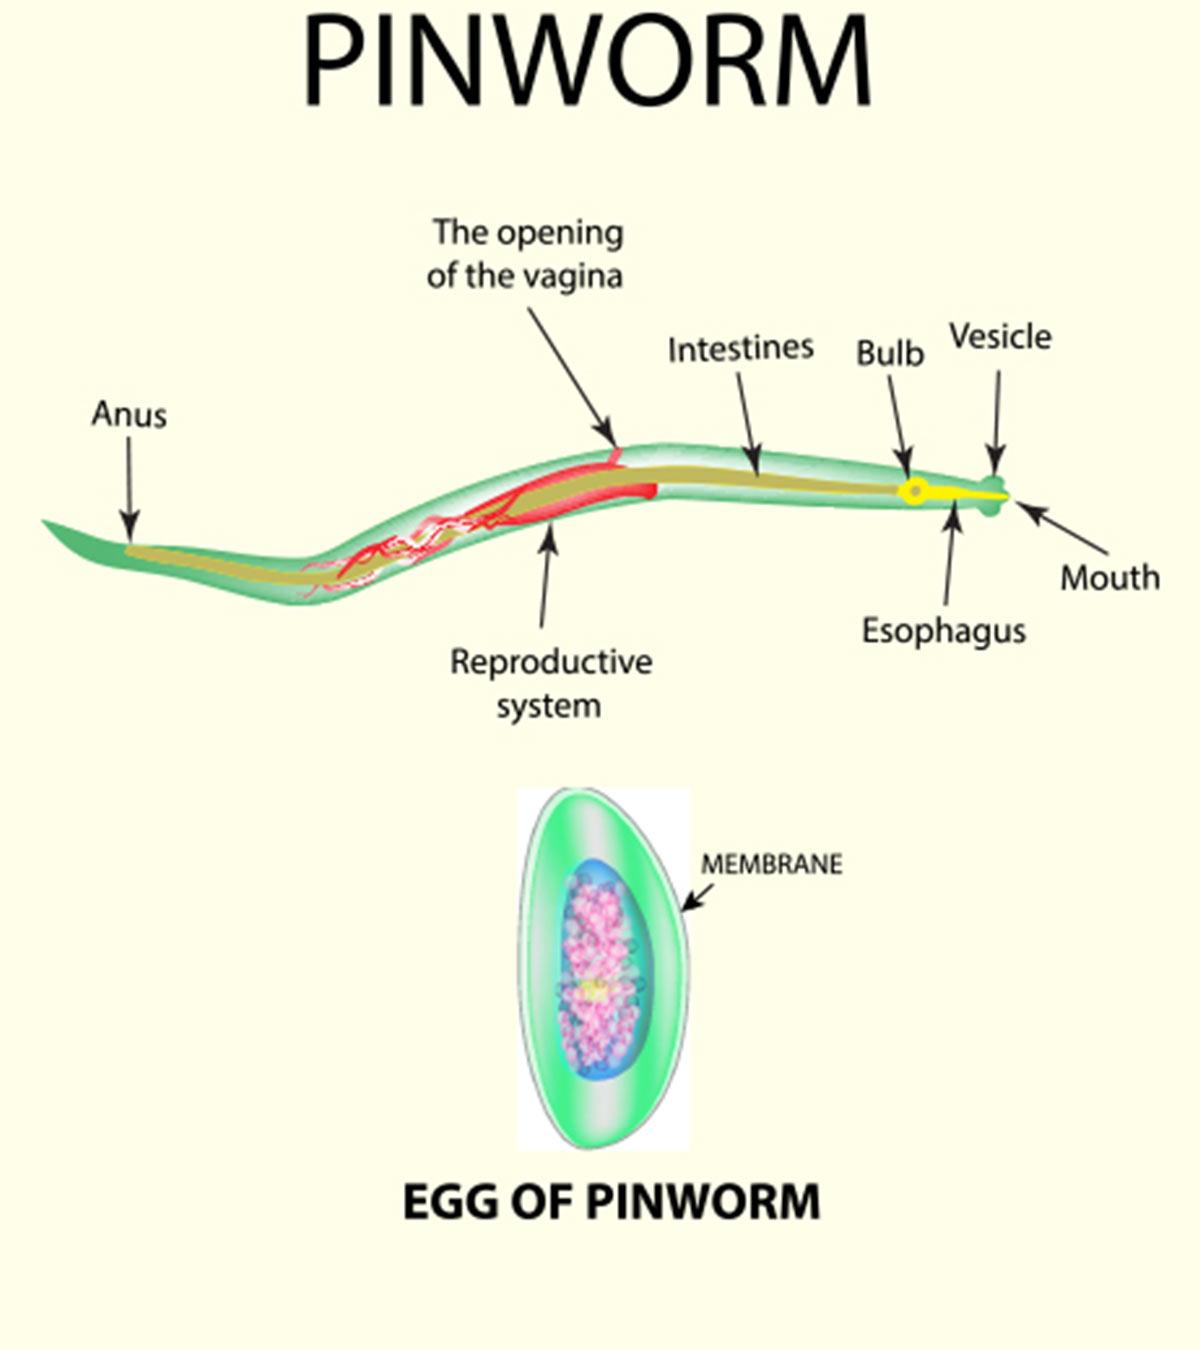 Enterobiasis recept. Hogyan kell kezelni pinworms - Diagnosztika March